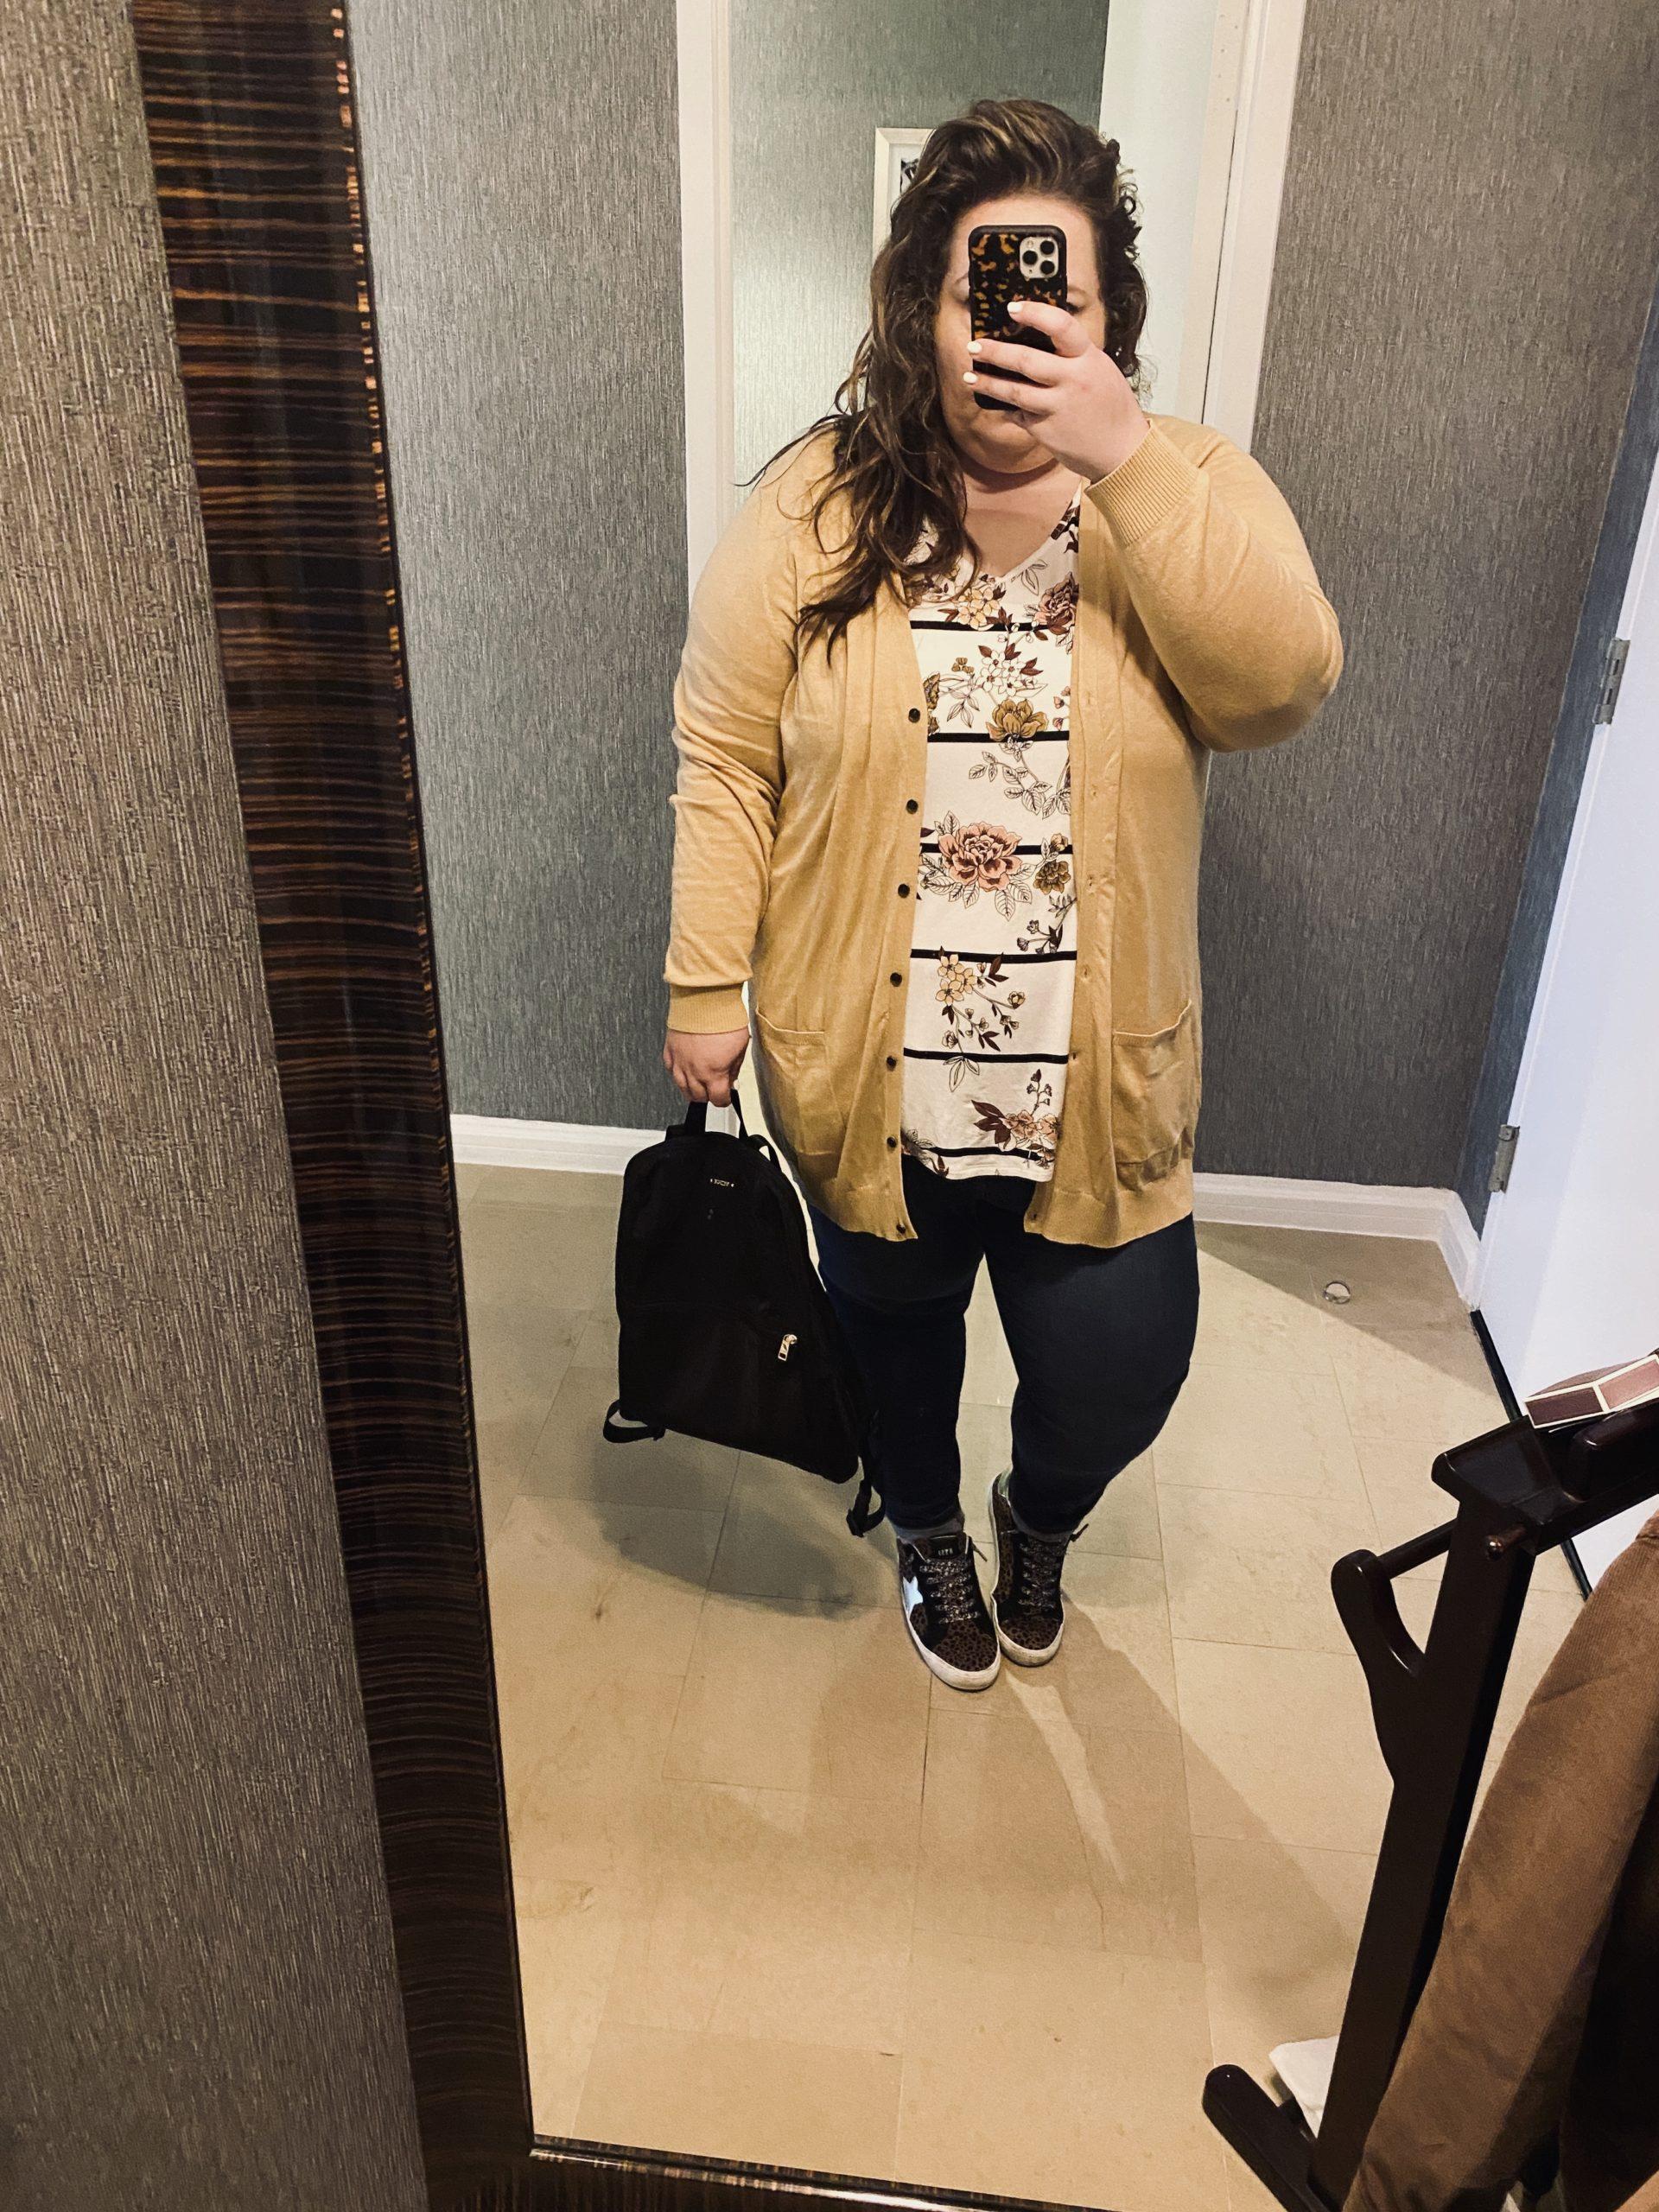 backpack, tumi backpack, atl, Atlanta, Atlanta shopping, travel, wanderlust